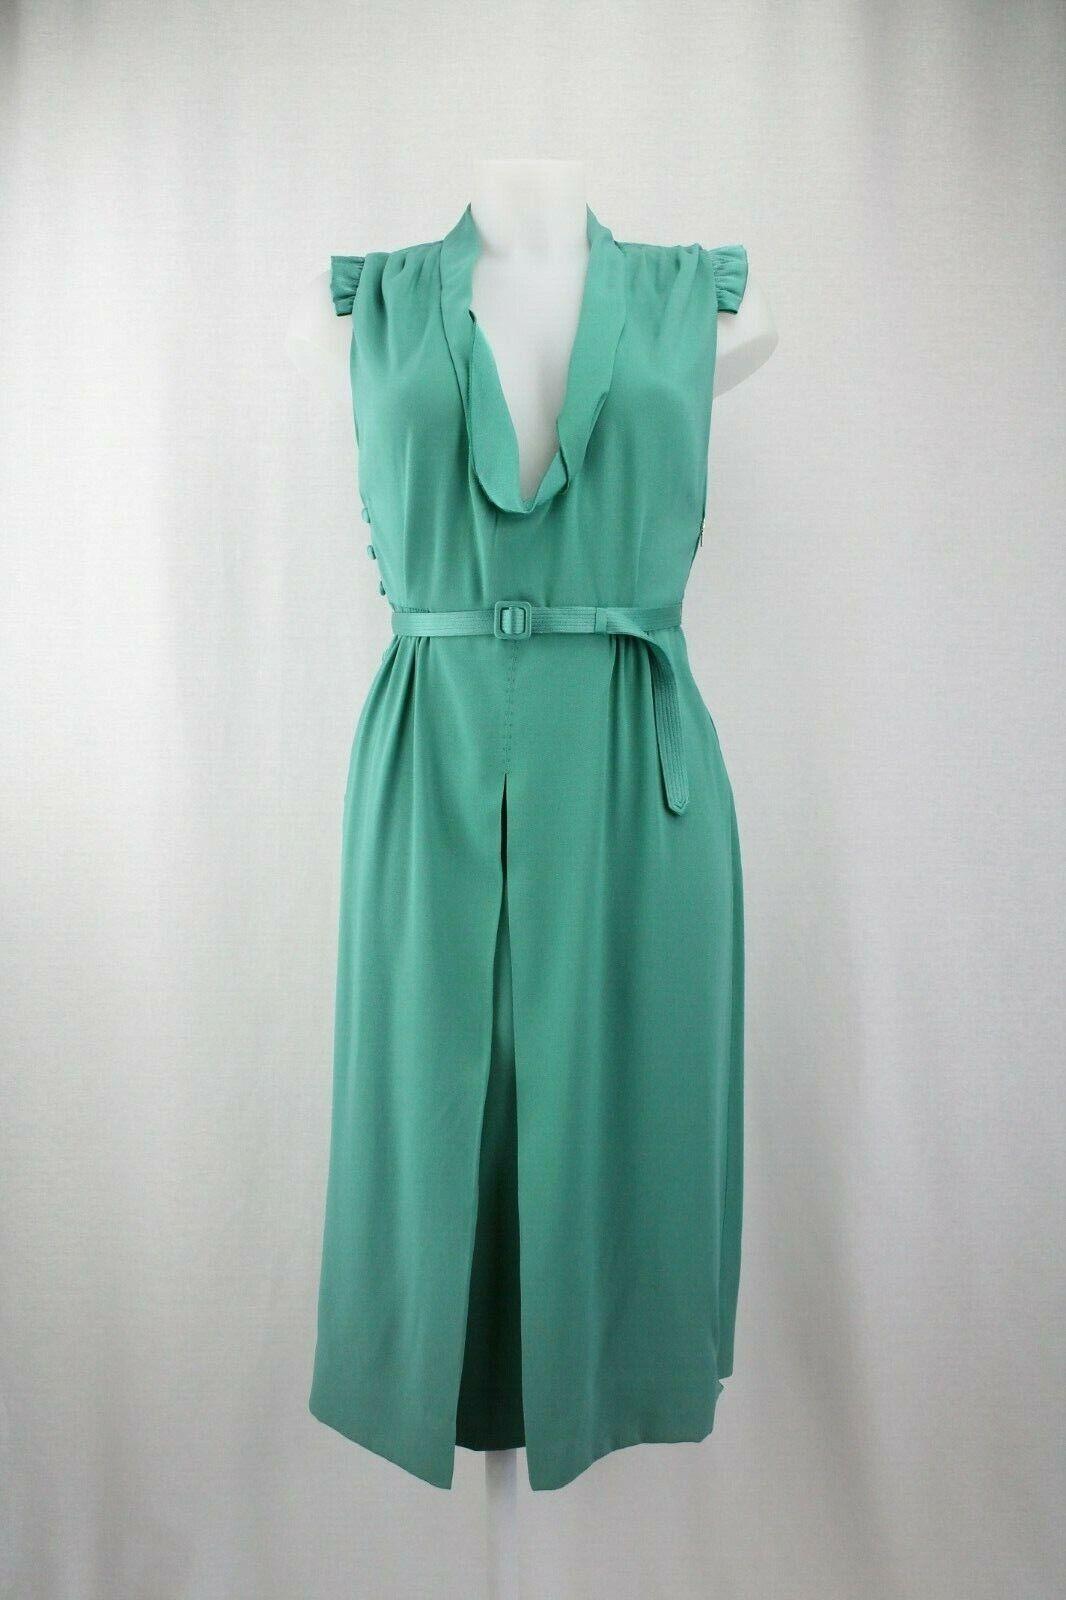 Marc Jacobs For Bergdorf Goodman Türkis Kleid mit Gürtel, Größe  UK 10   Eu 38